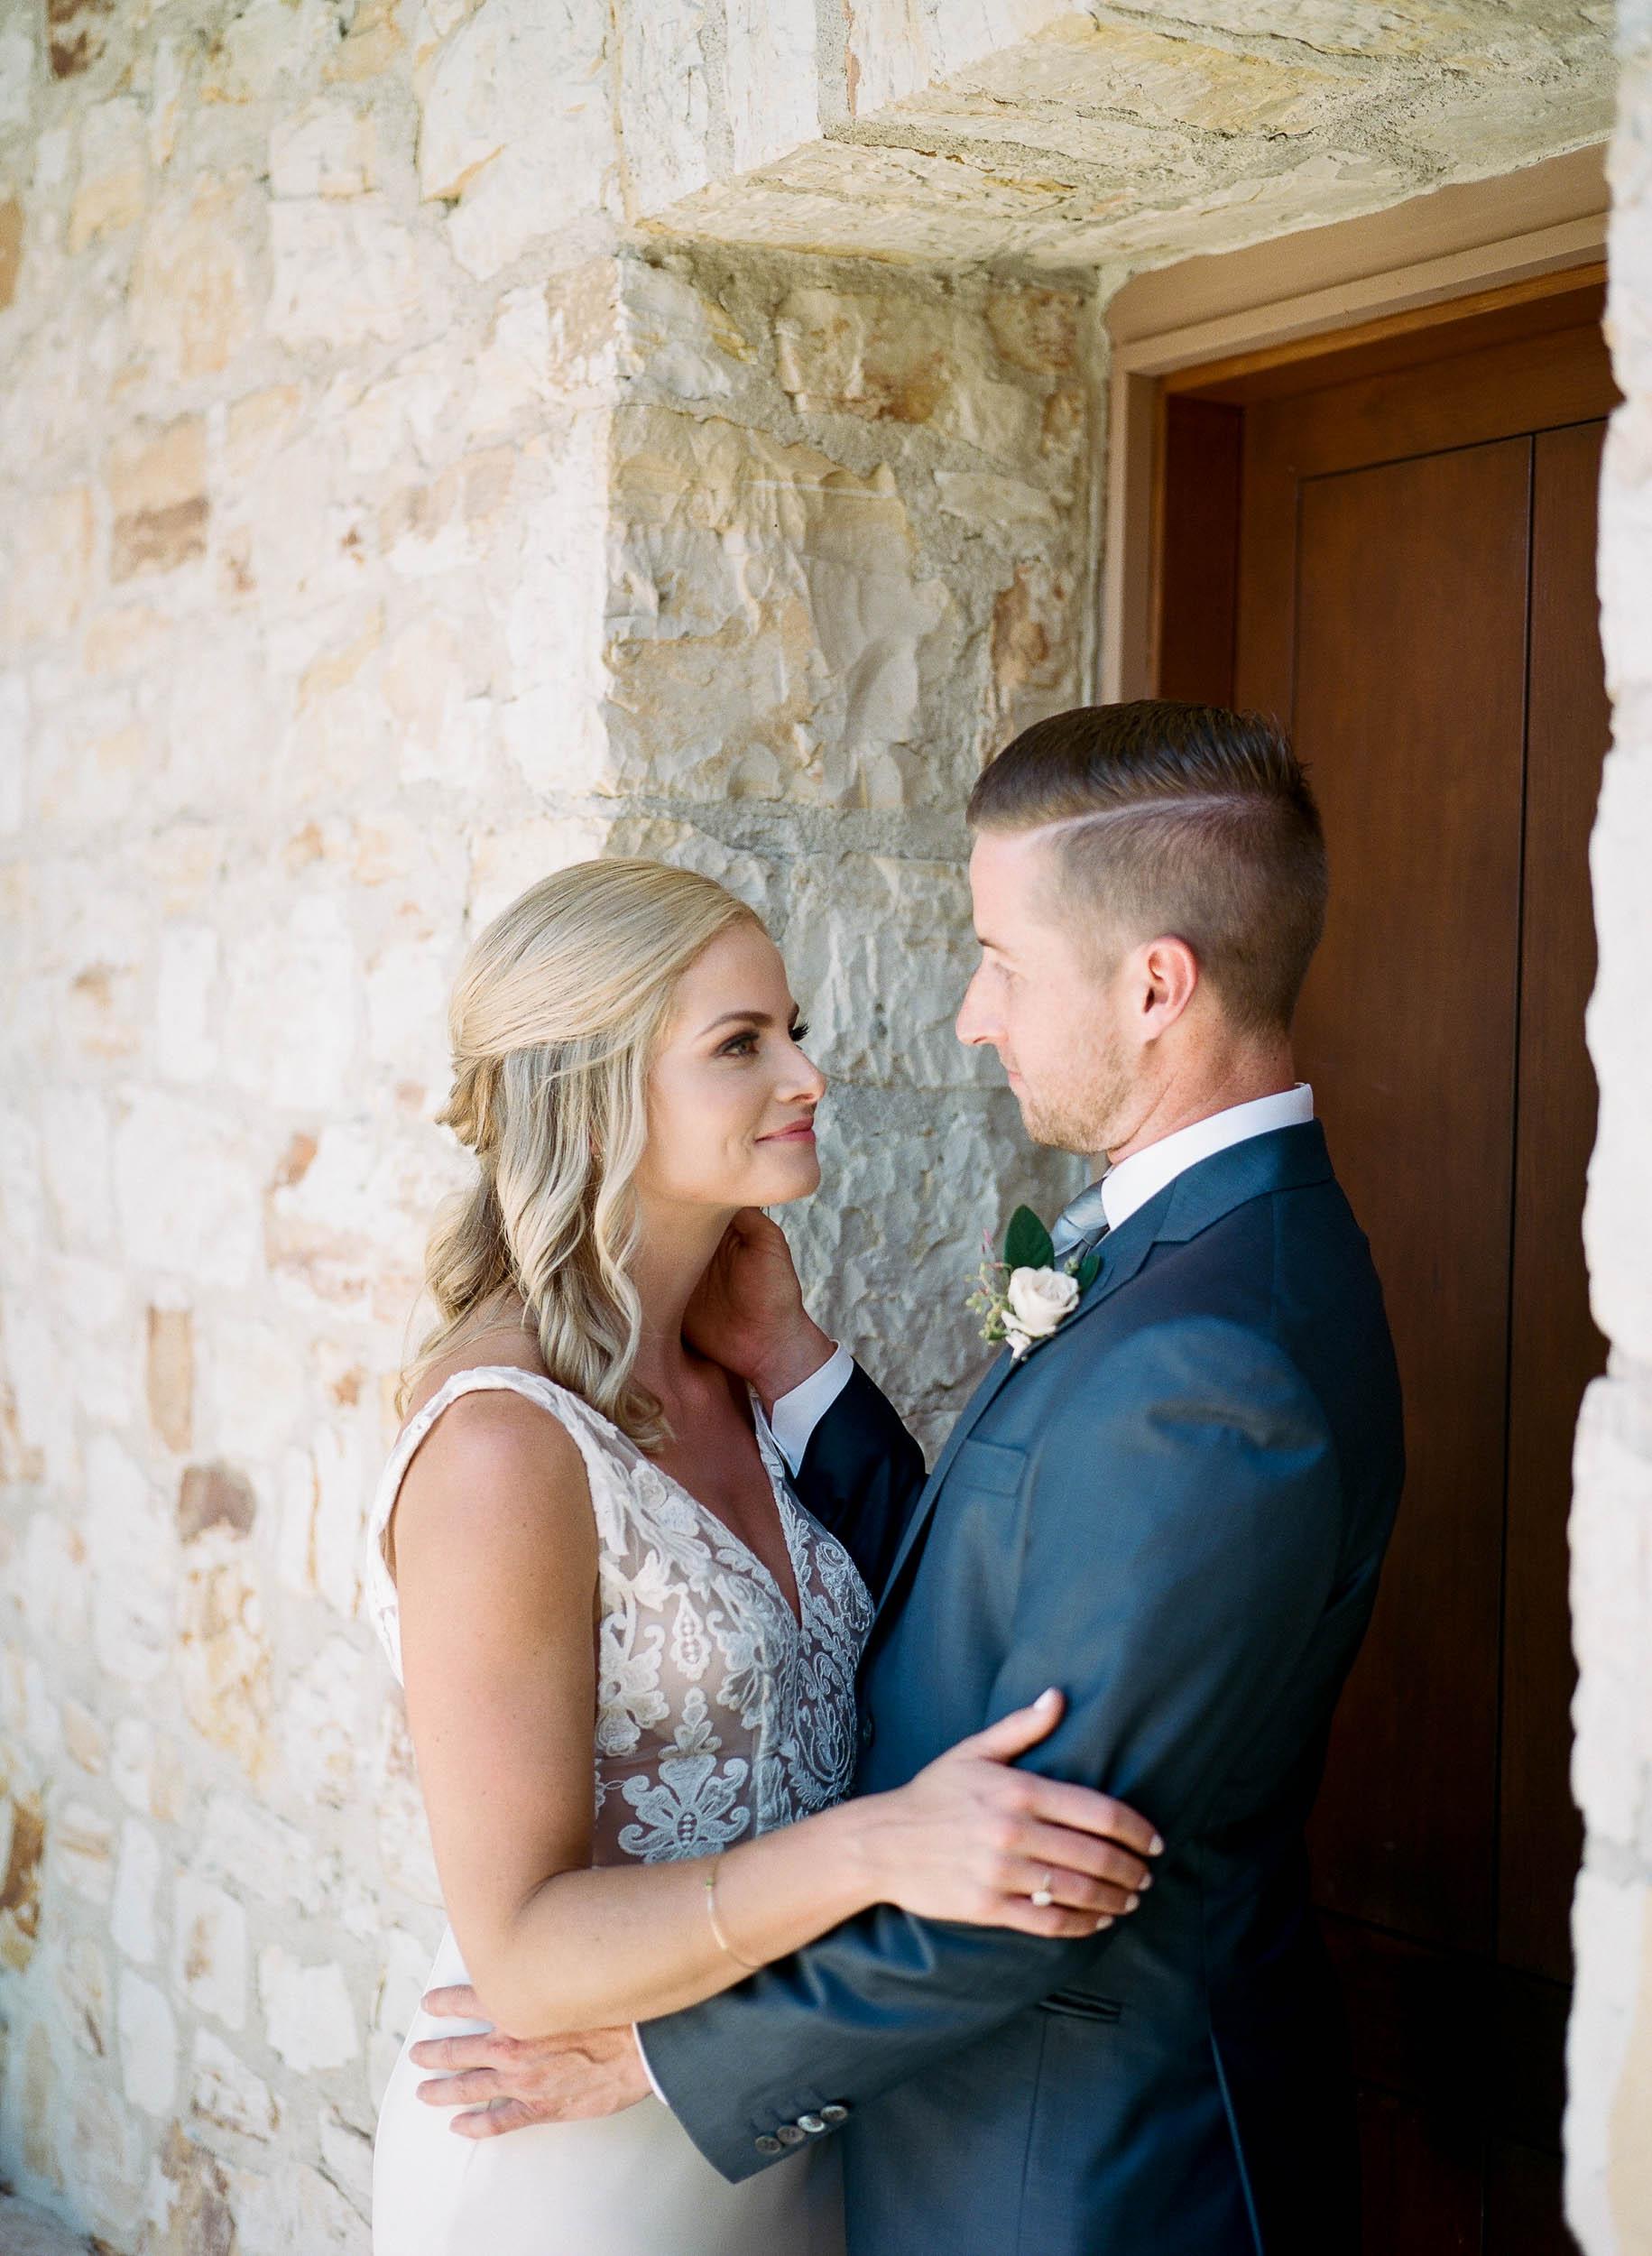 026_072118_D+K_Holman Ranch Wedding_Buena Lane Photography_00005428_107 copy.jpg